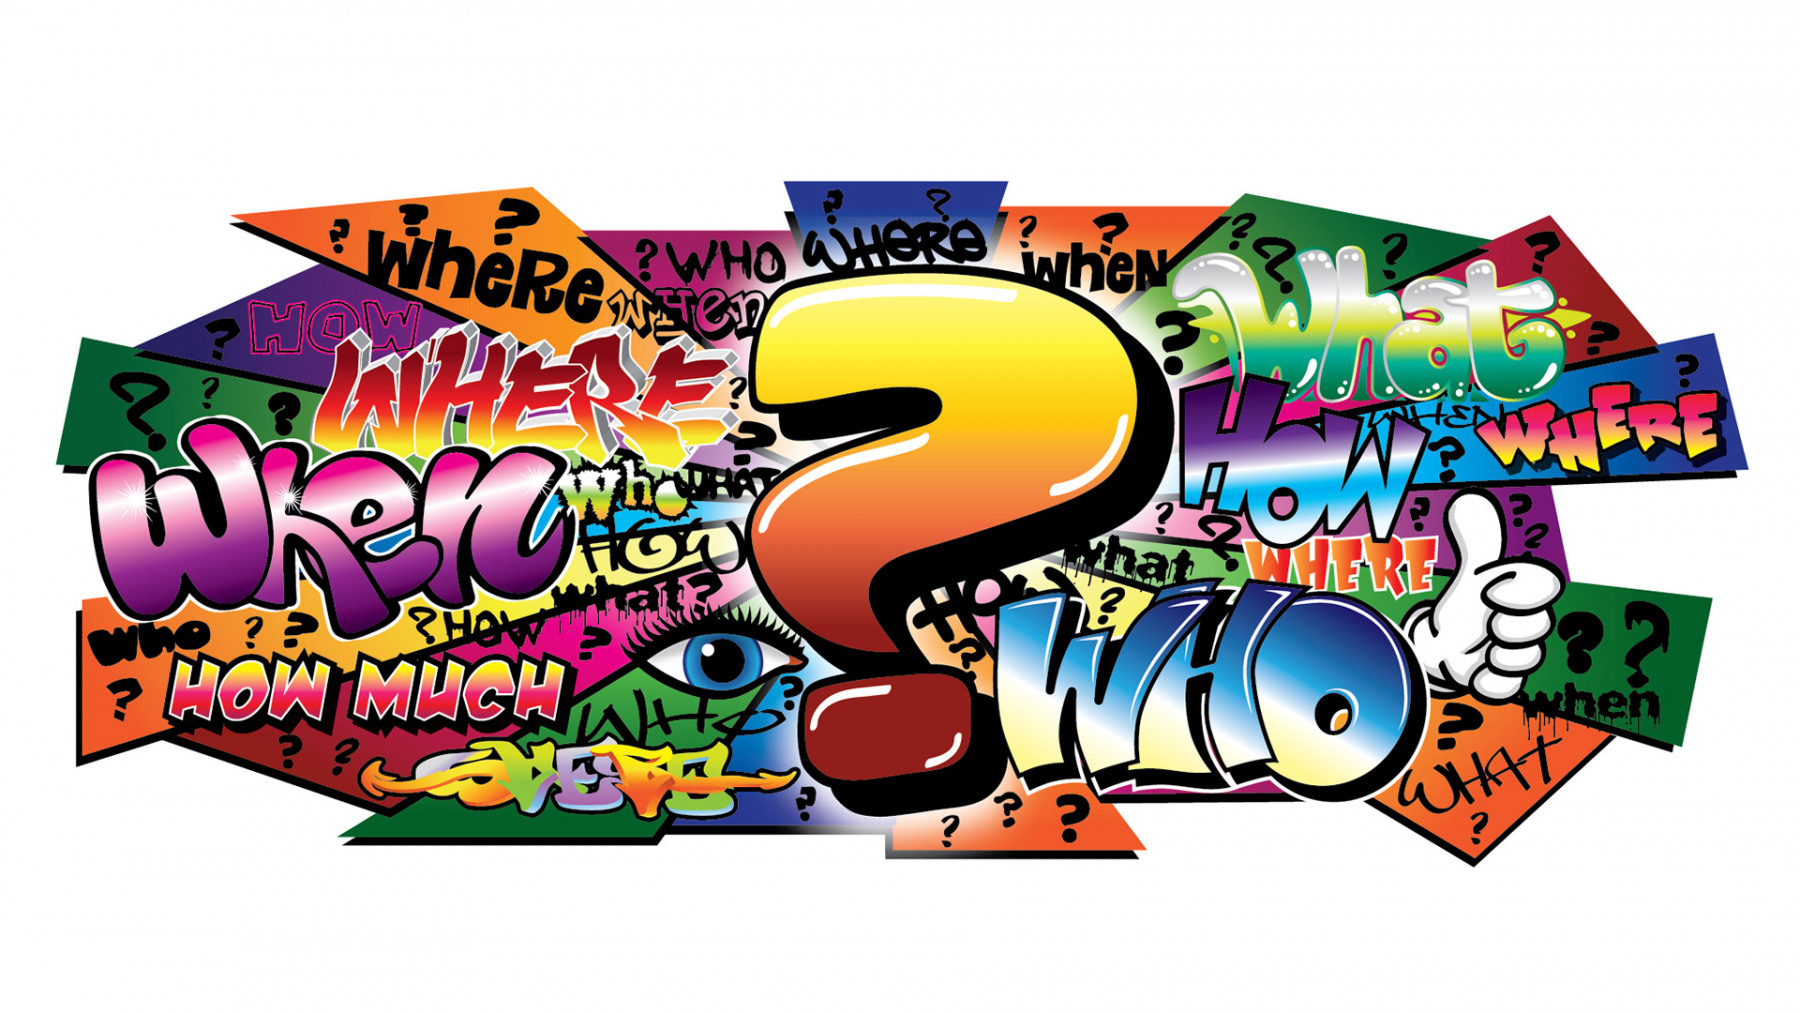 Q-MARK GRAFFITI ILLUSTRATOR IMAGE